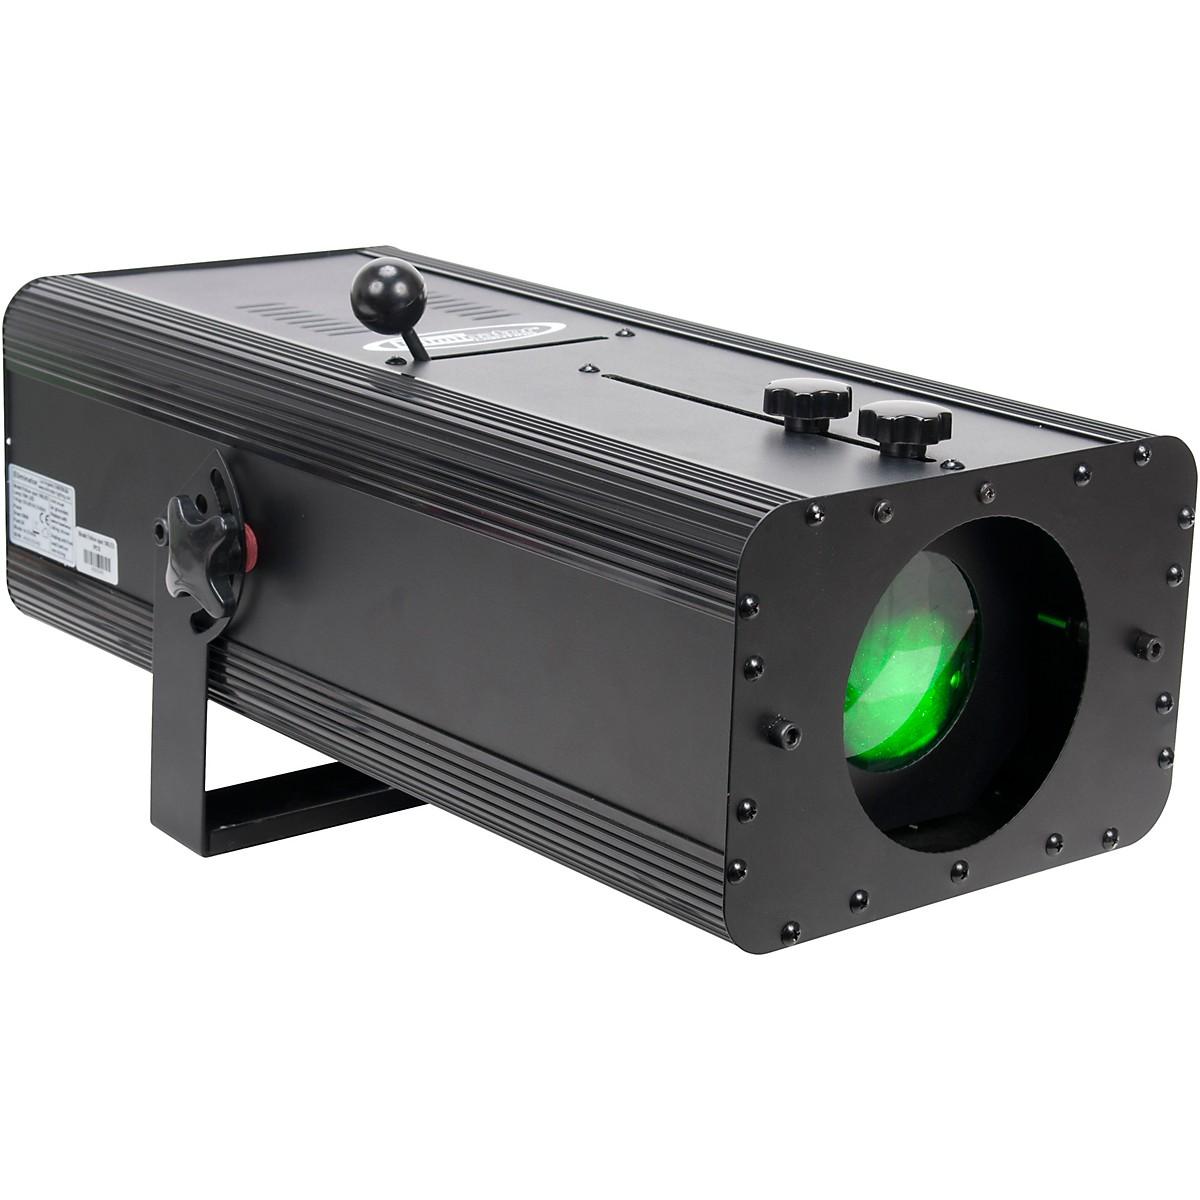 Eliminator Lighting Follow Spot 100 LED Spotlight